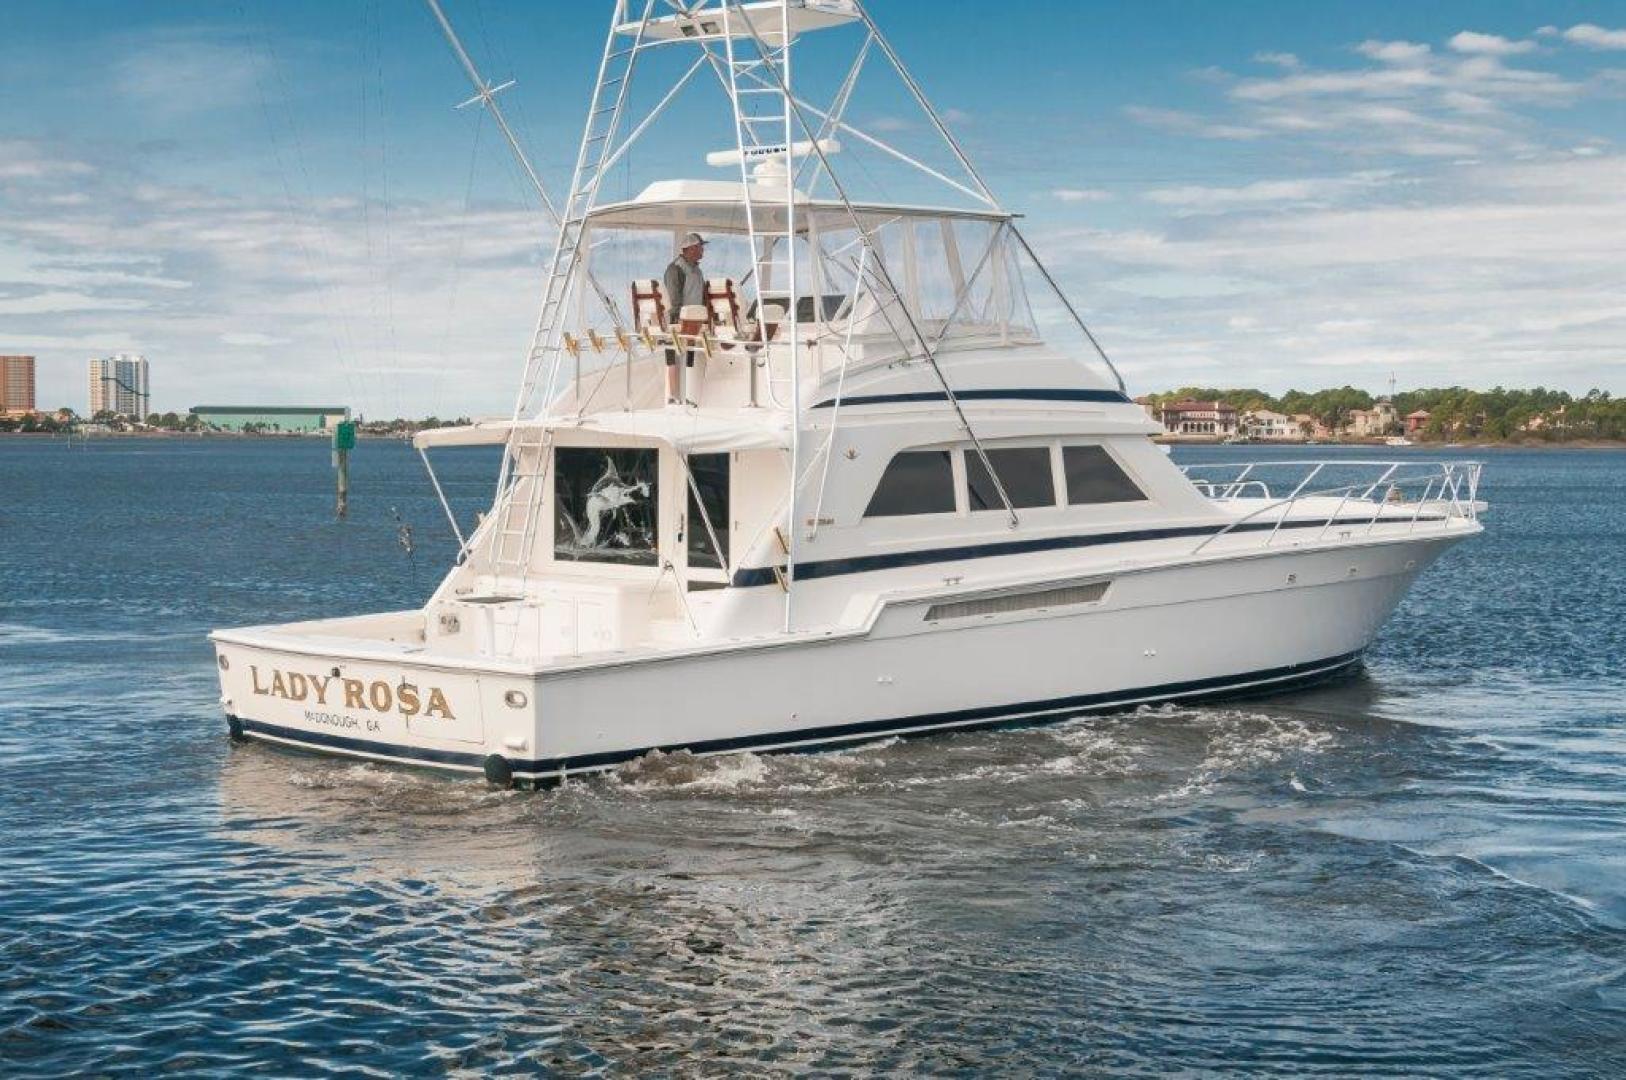 Bertram-60 Convertible 1998-Lady Rosa Pensacola-Florida-United States-1998 60 Bertram Convertible Lady Rosa Starboard Quarter-720380   Thumbnail